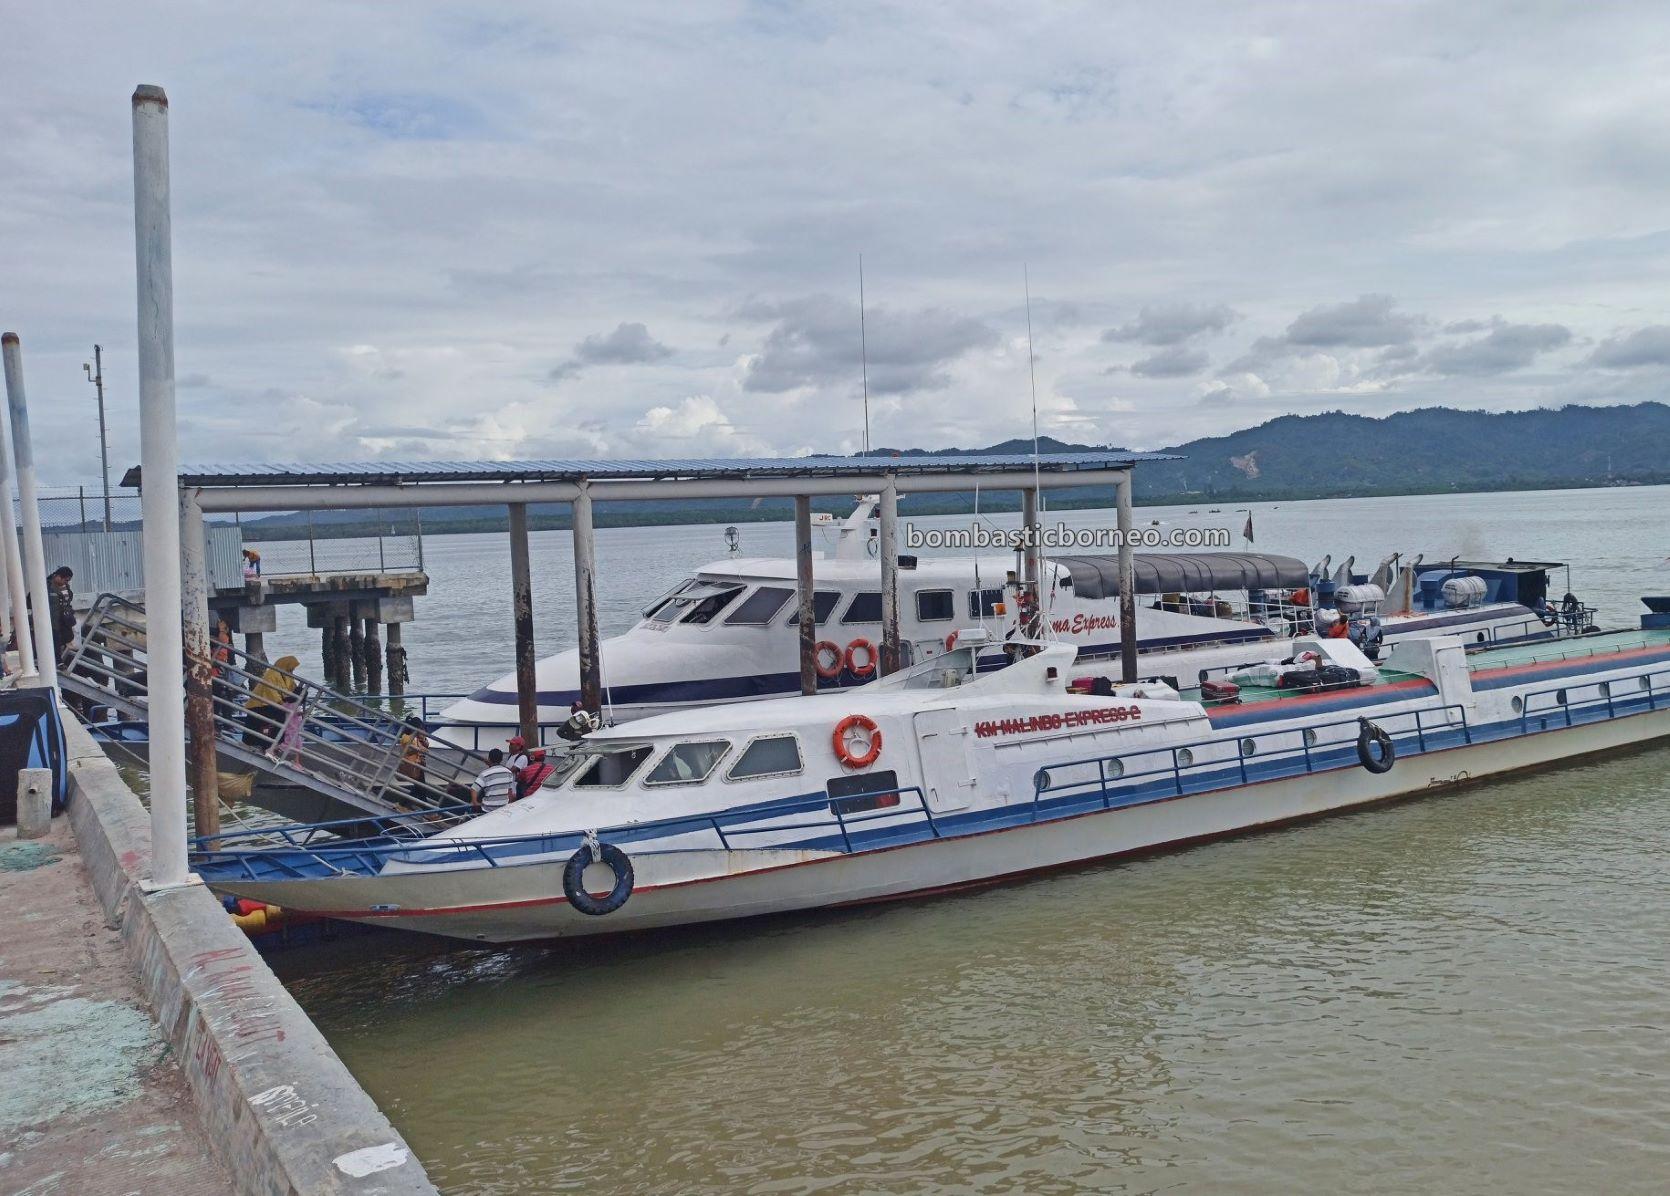 Speedboat, express boat, ferry ride, Transportation, backpackers, destination, exploration, Indonesia, Kalimantan Utara, tourism, travel guide, Trans Border, Borneo, 跨境婆罗洲游踪, 印尼北加里曼丹